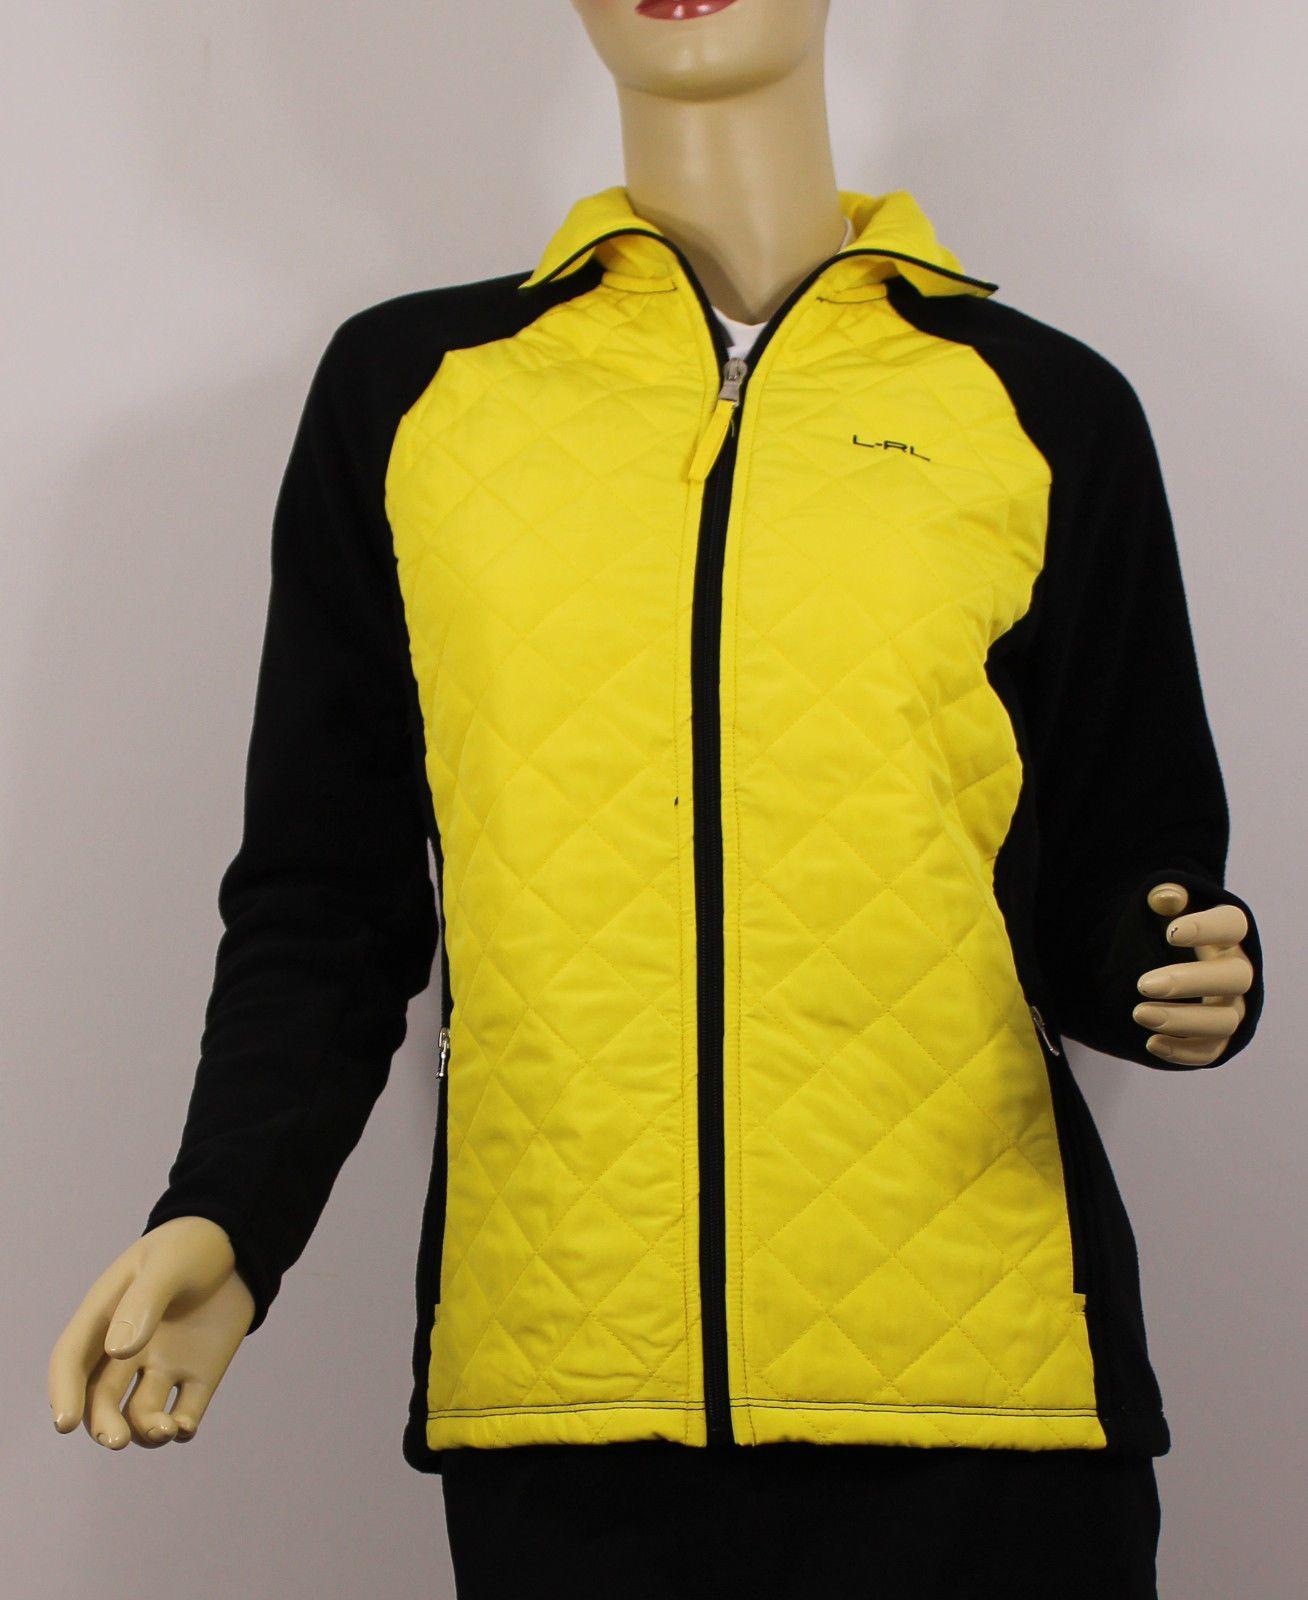 Jacket Puffer Quilted Womens Ralph Yellow Medium Lauren Coat Black ZnzxnEwUqS